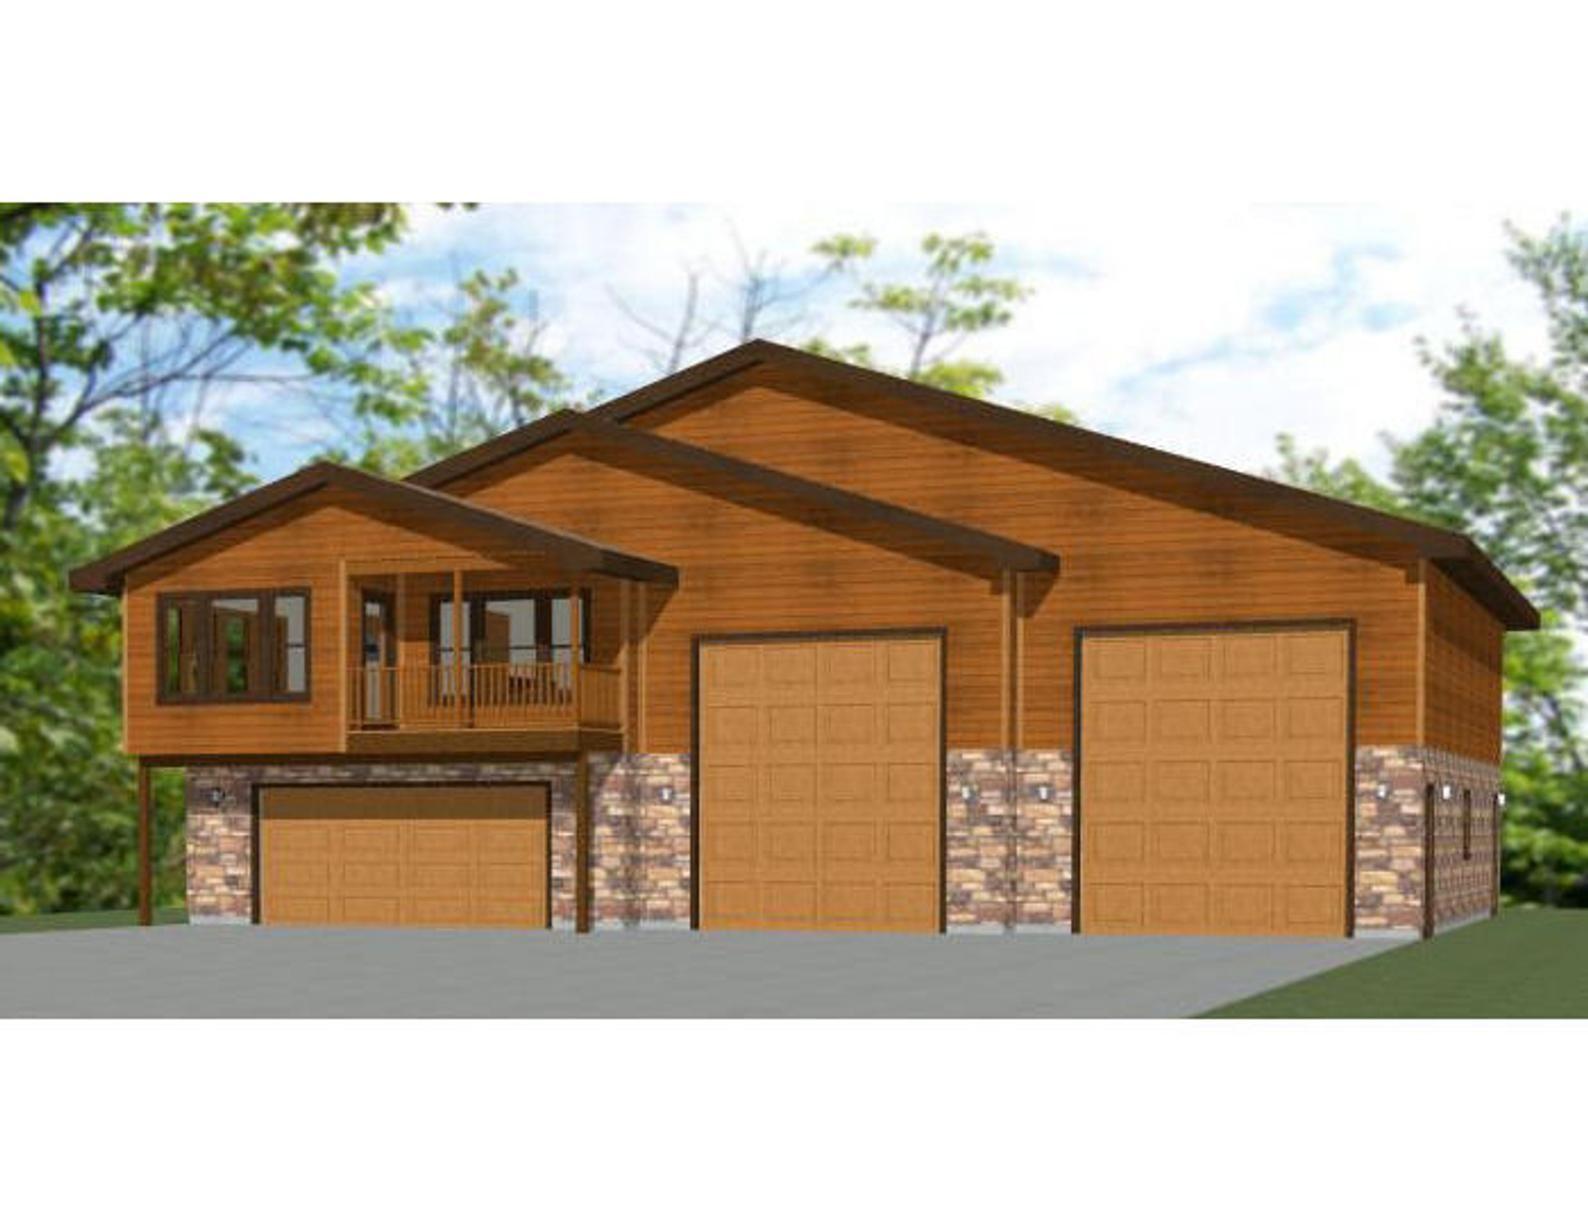 60x50 House 2Bedroom 2.5Bath 1694 sq ft PDF Floor Etsy